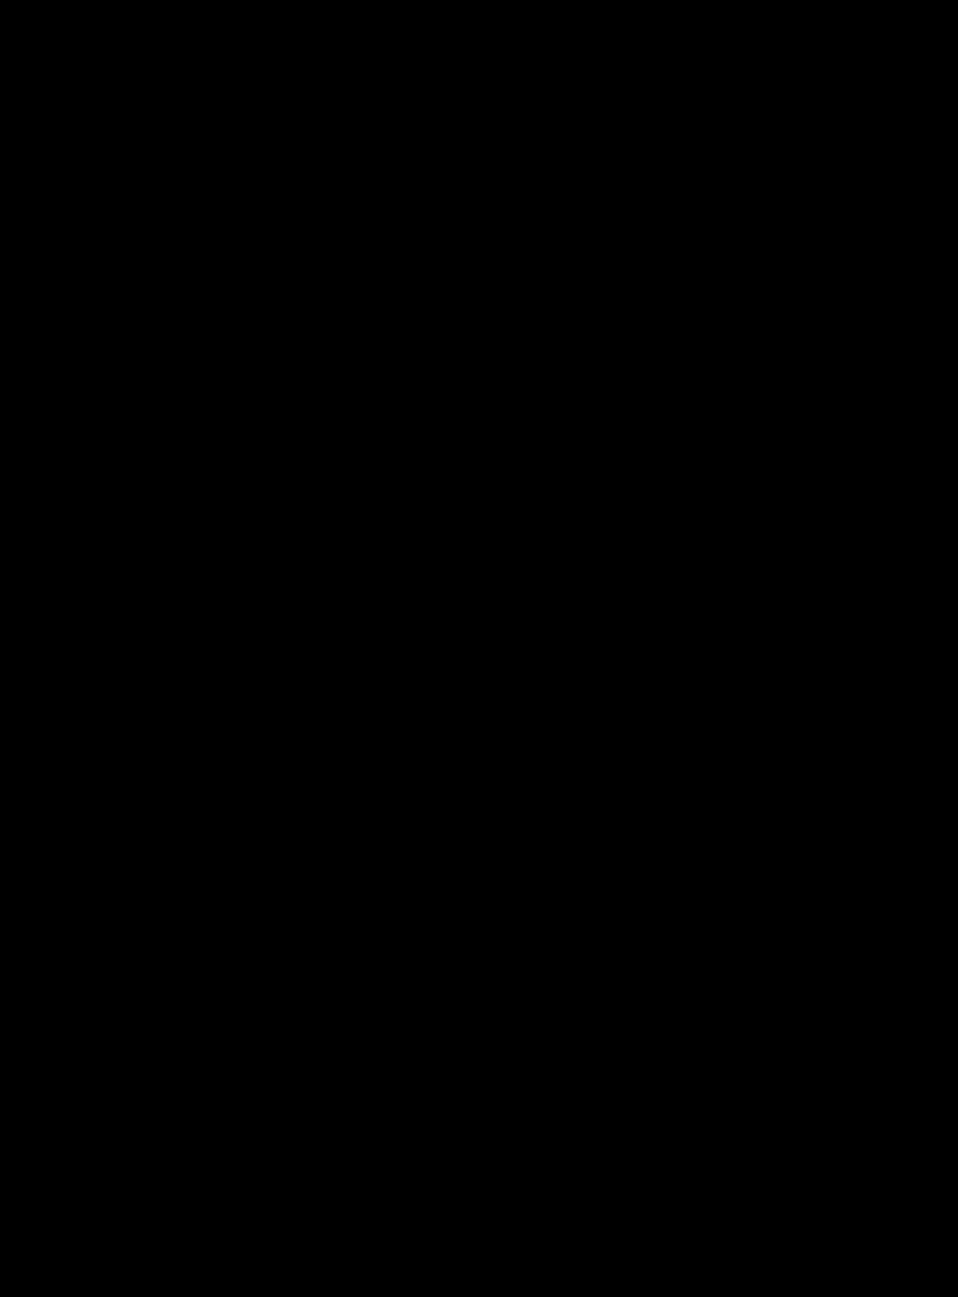 Poppy clipart small. Public domain clip art